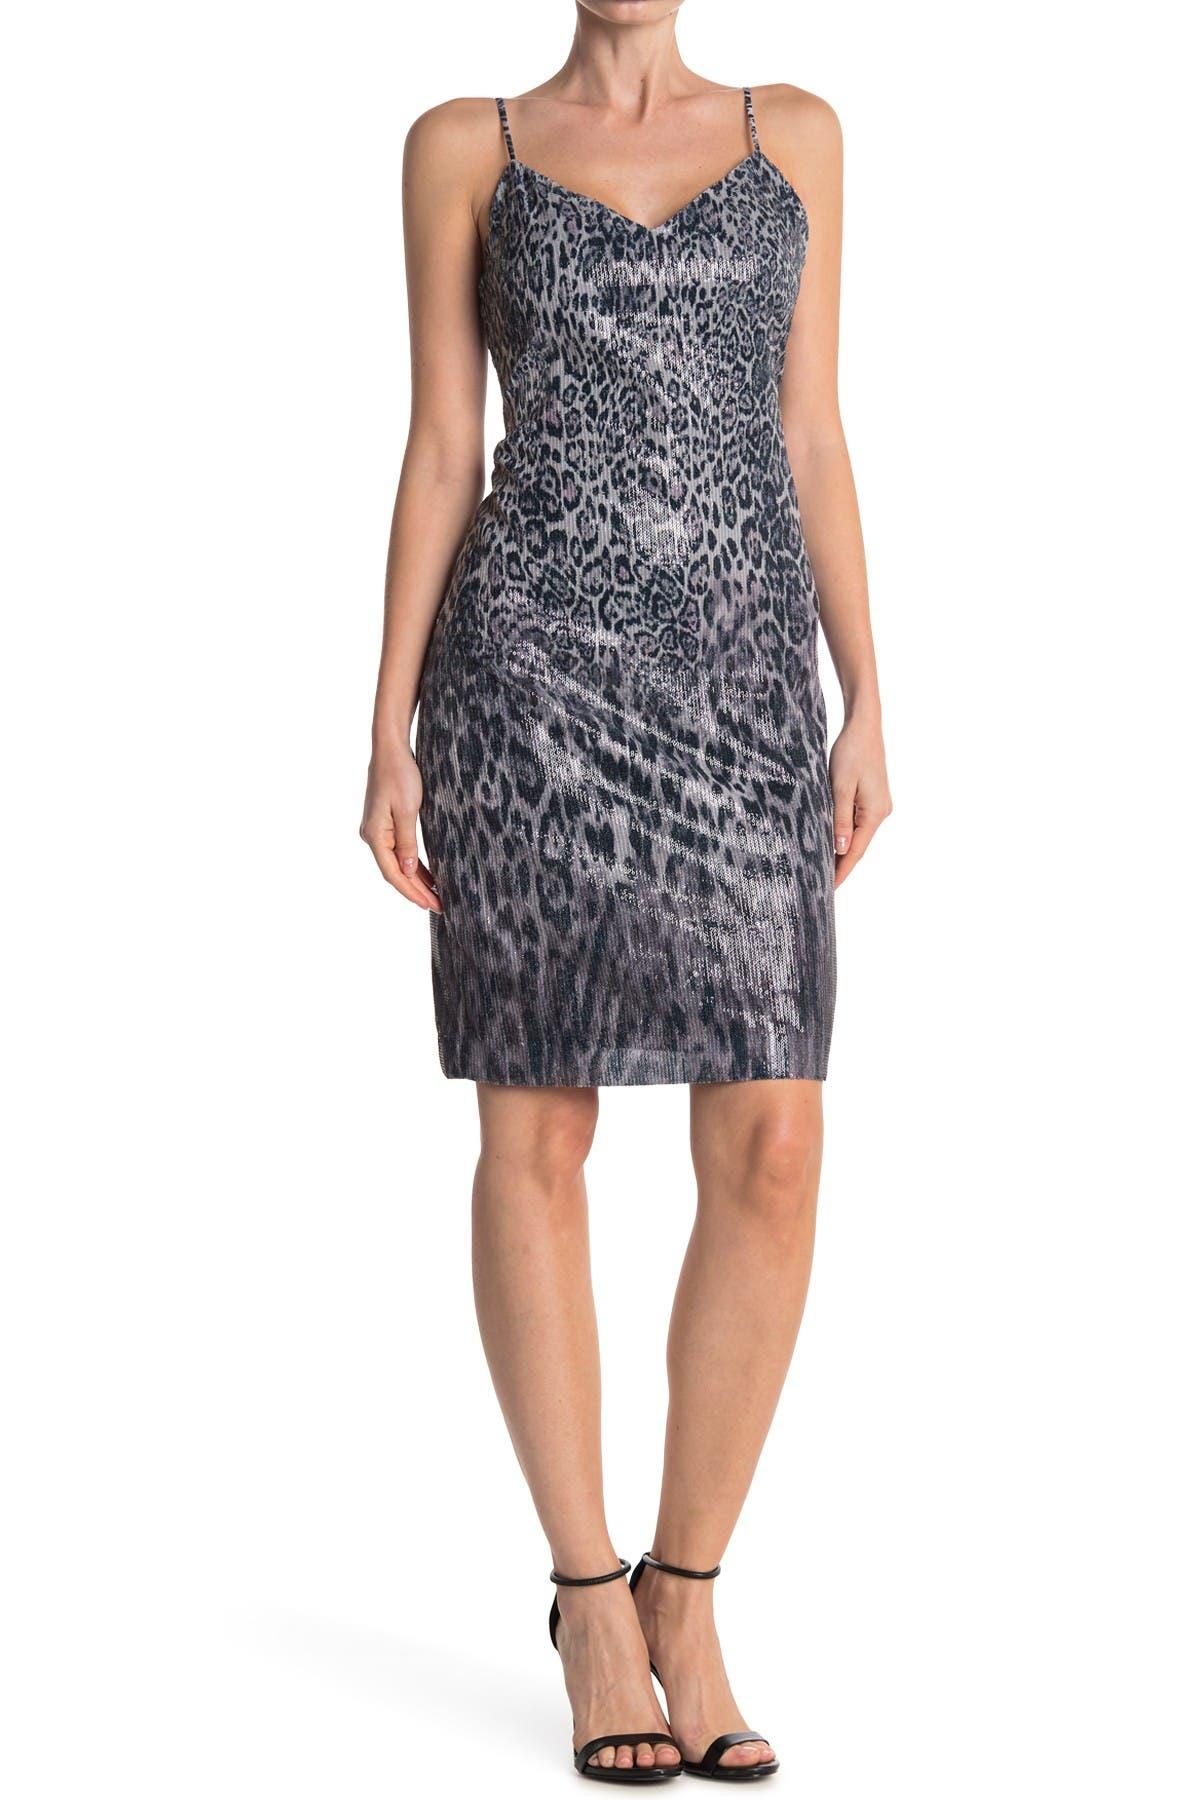 Image of Elie Tahari Yesmina Leopard V-Neck Dress